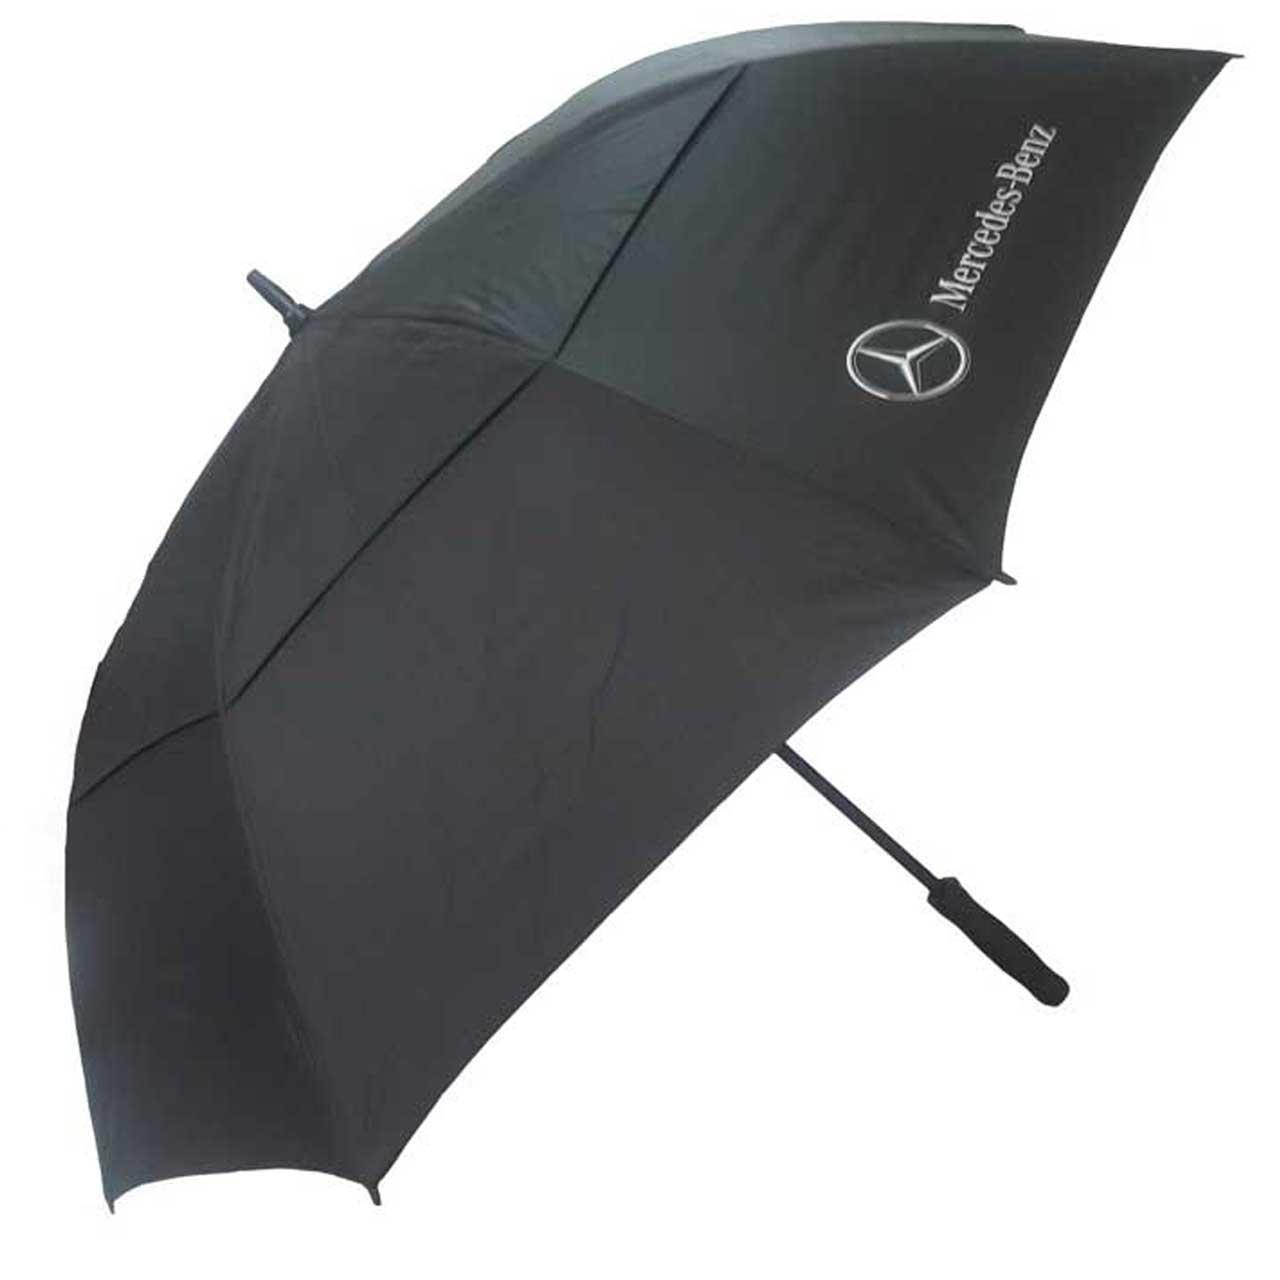 چتر مرسدس بنز کد 1